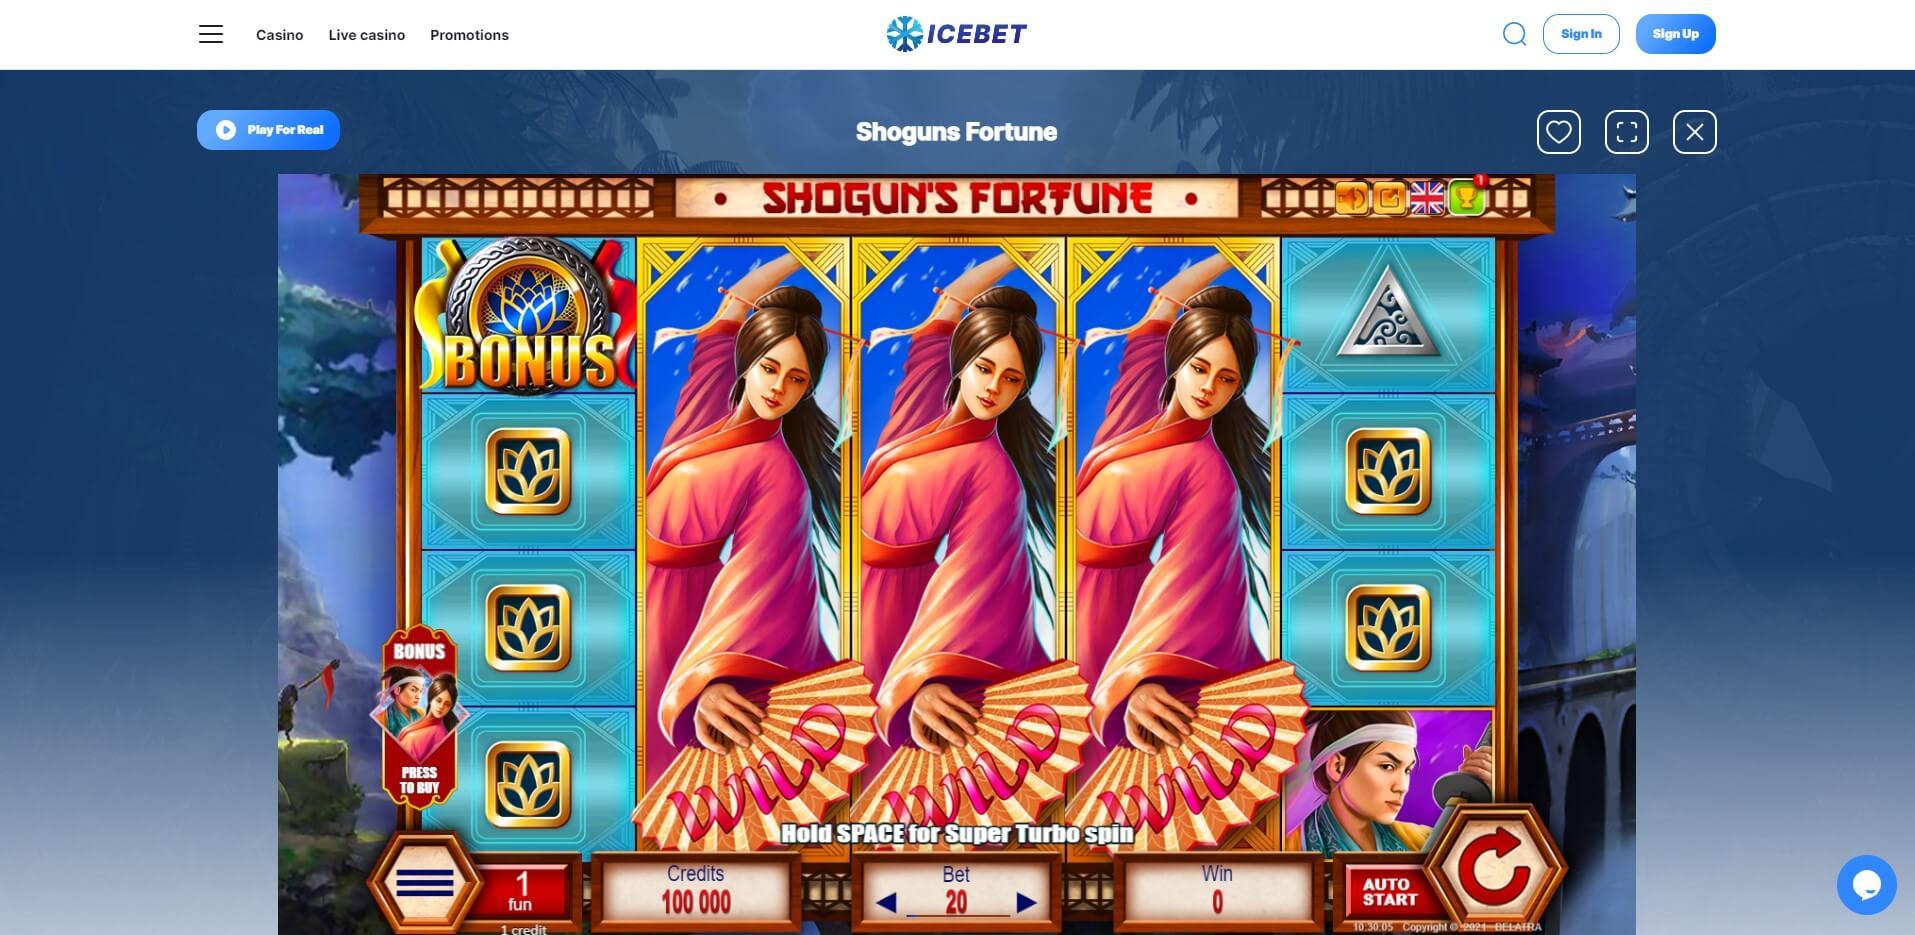 Game Play at Icebet Casino